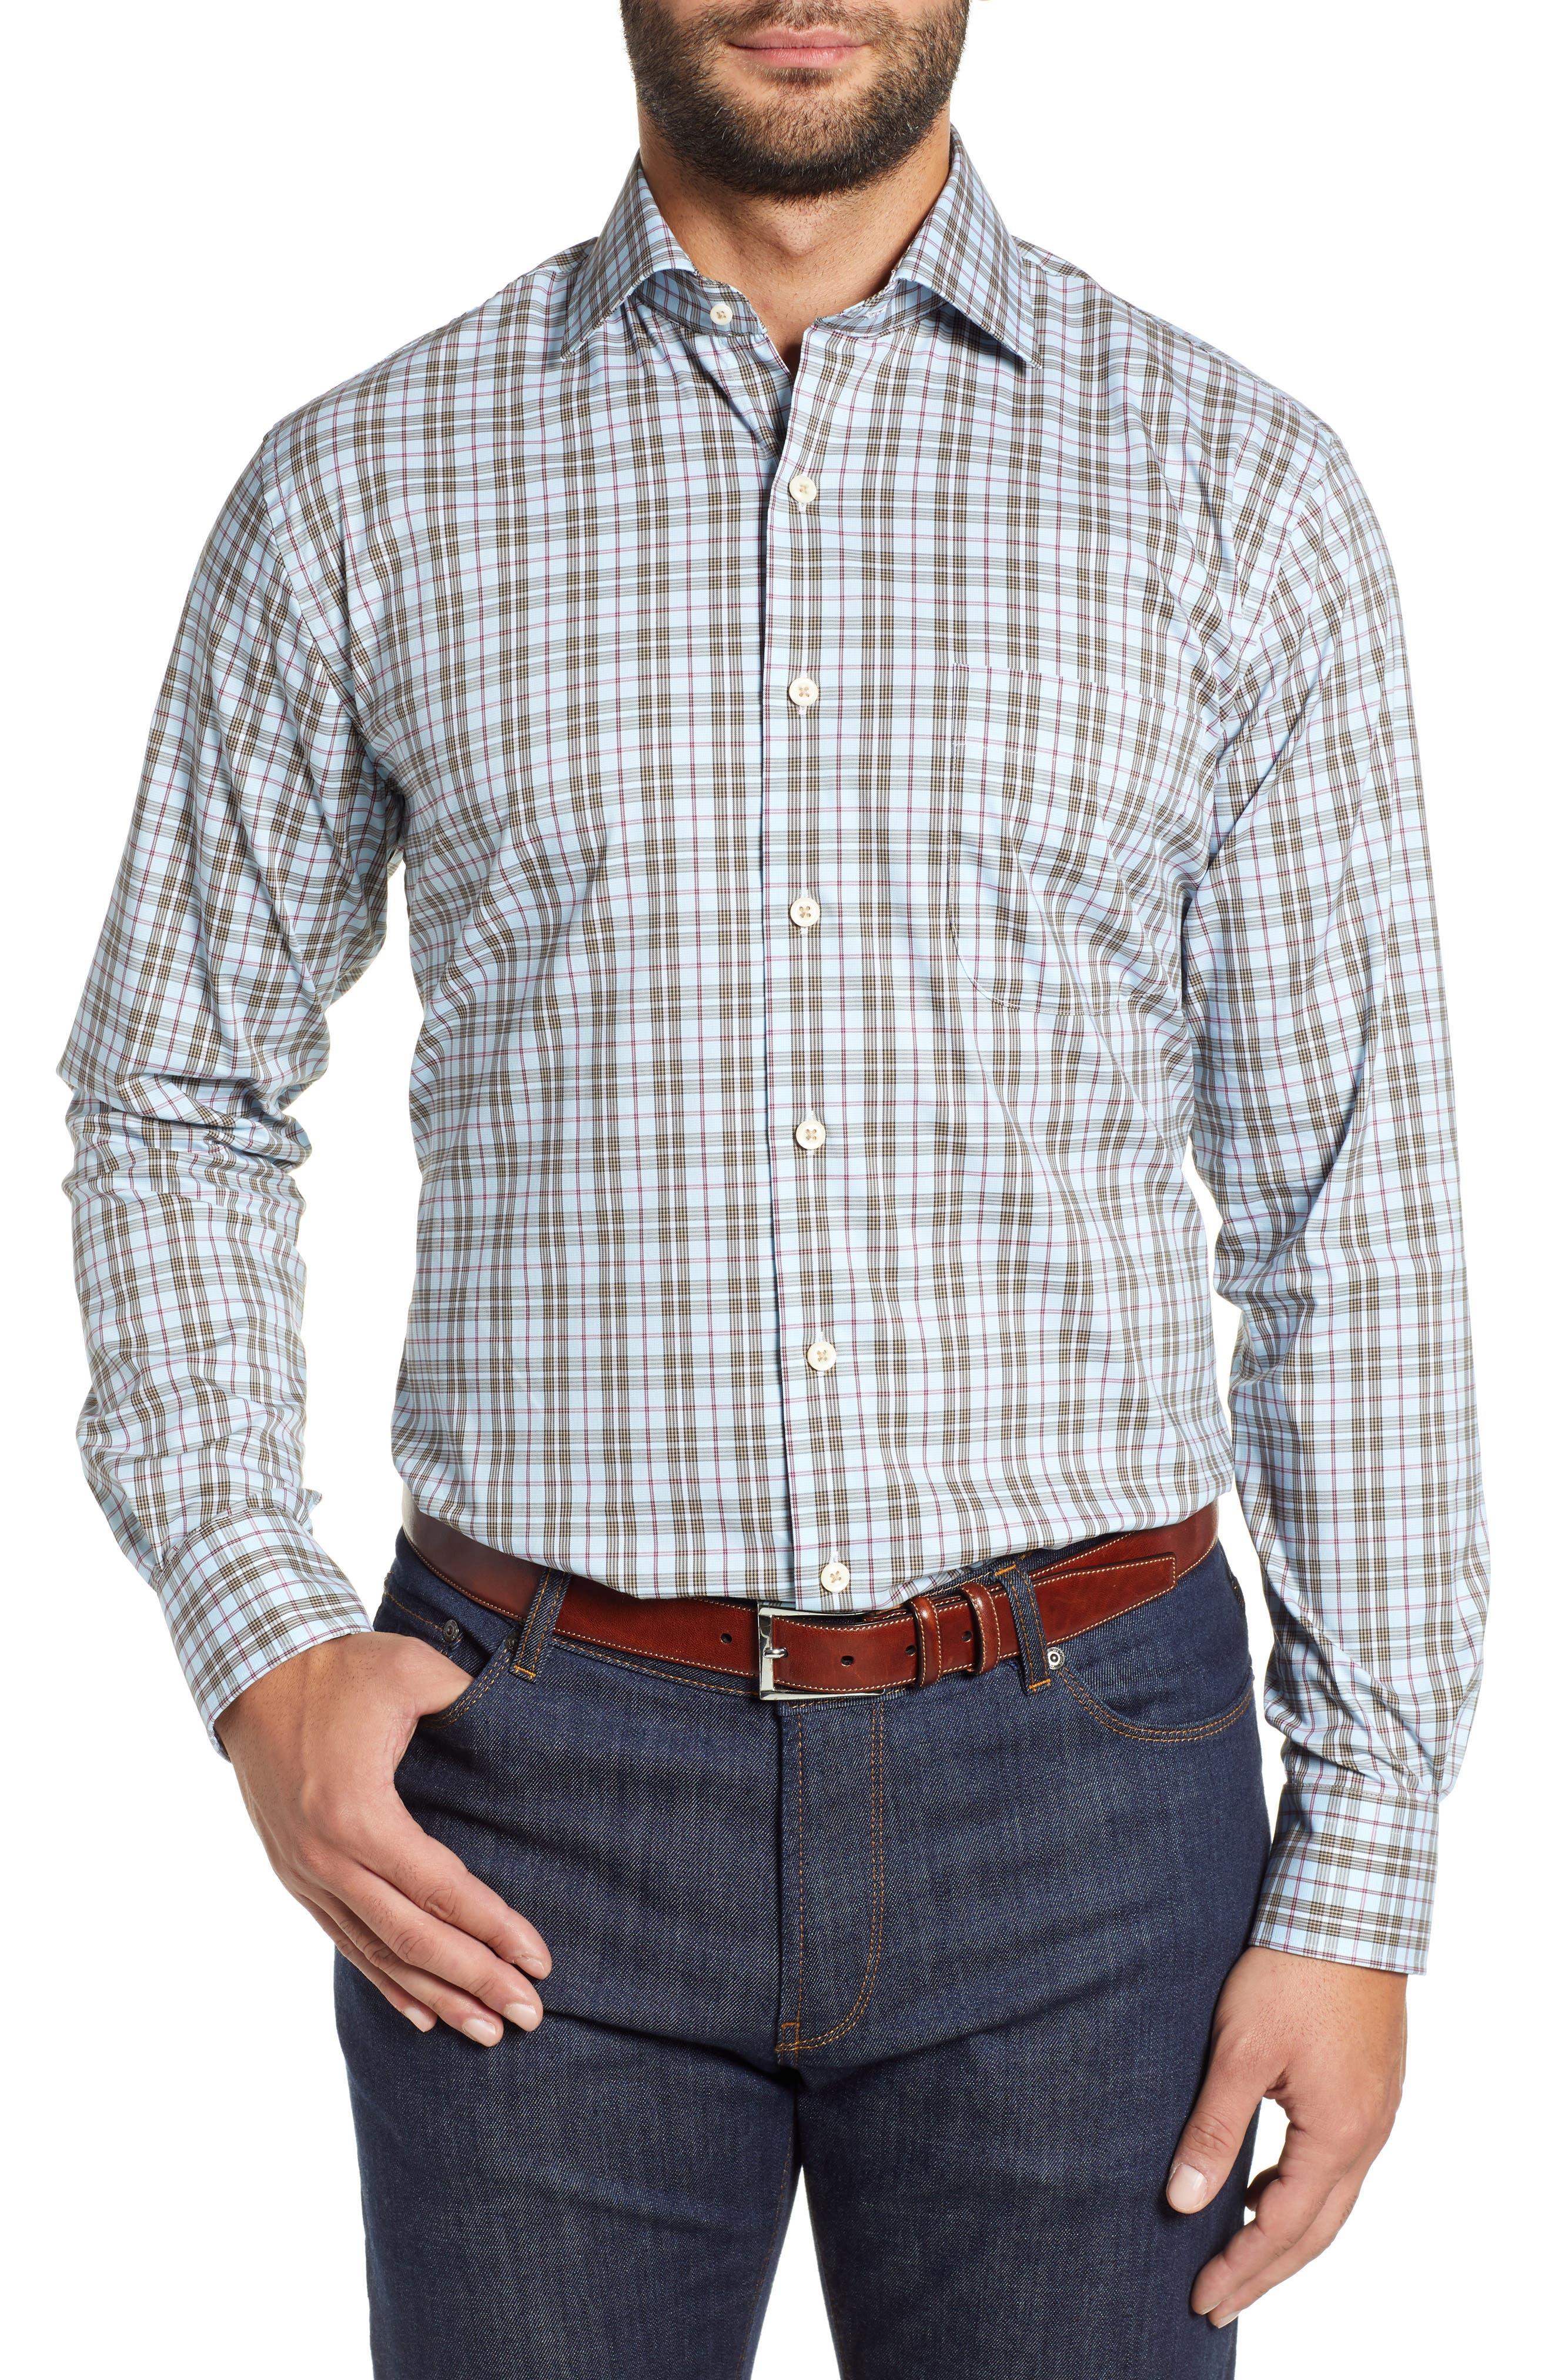 Crown Comfort Hazel Glen Regular Fit Sport Shirt,                             Main thumbnail 1, color,                             477